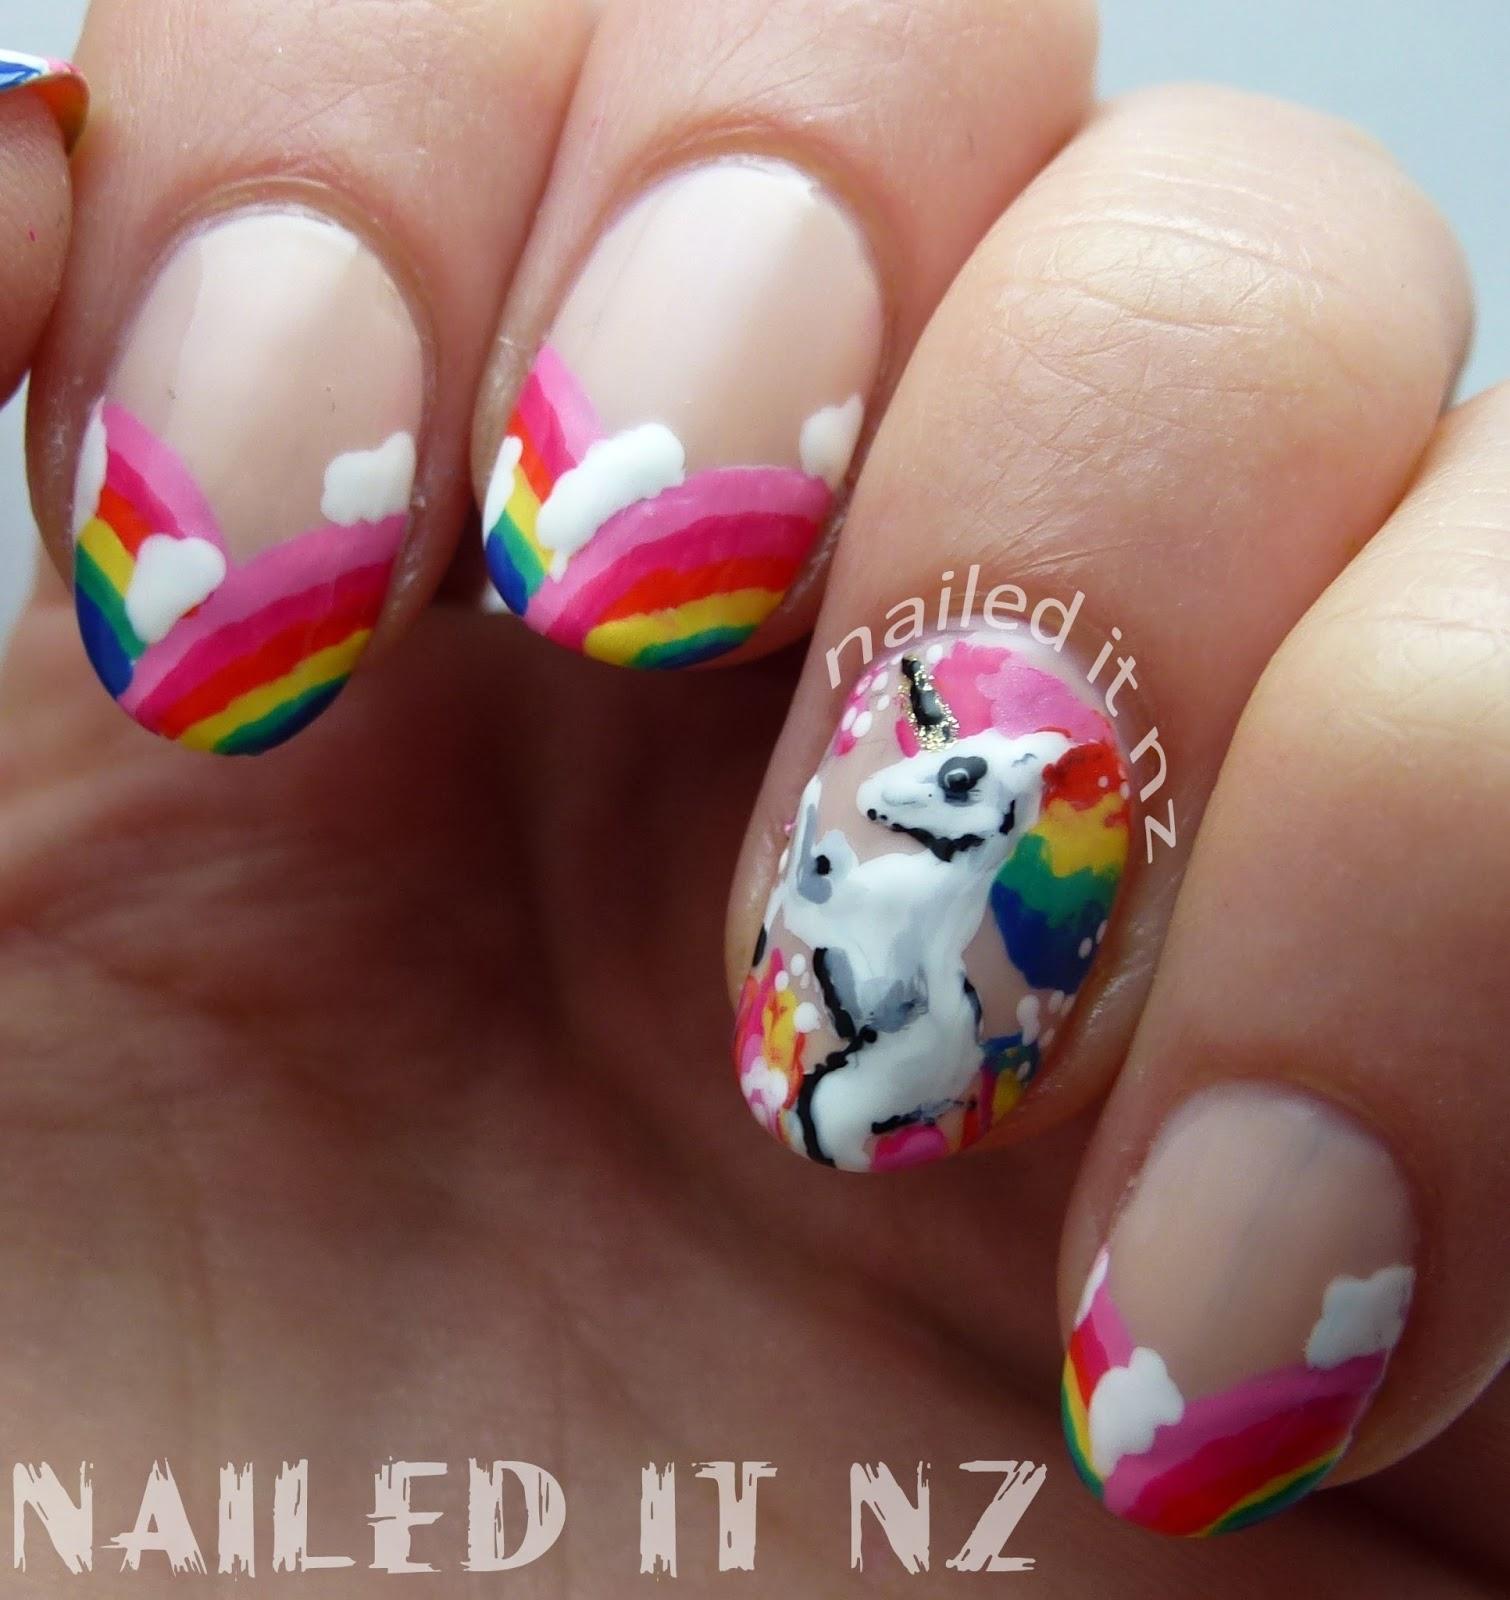 Nailed It NZ - Rainbow Unicorn Nail Art - Inspired By Robin Moses